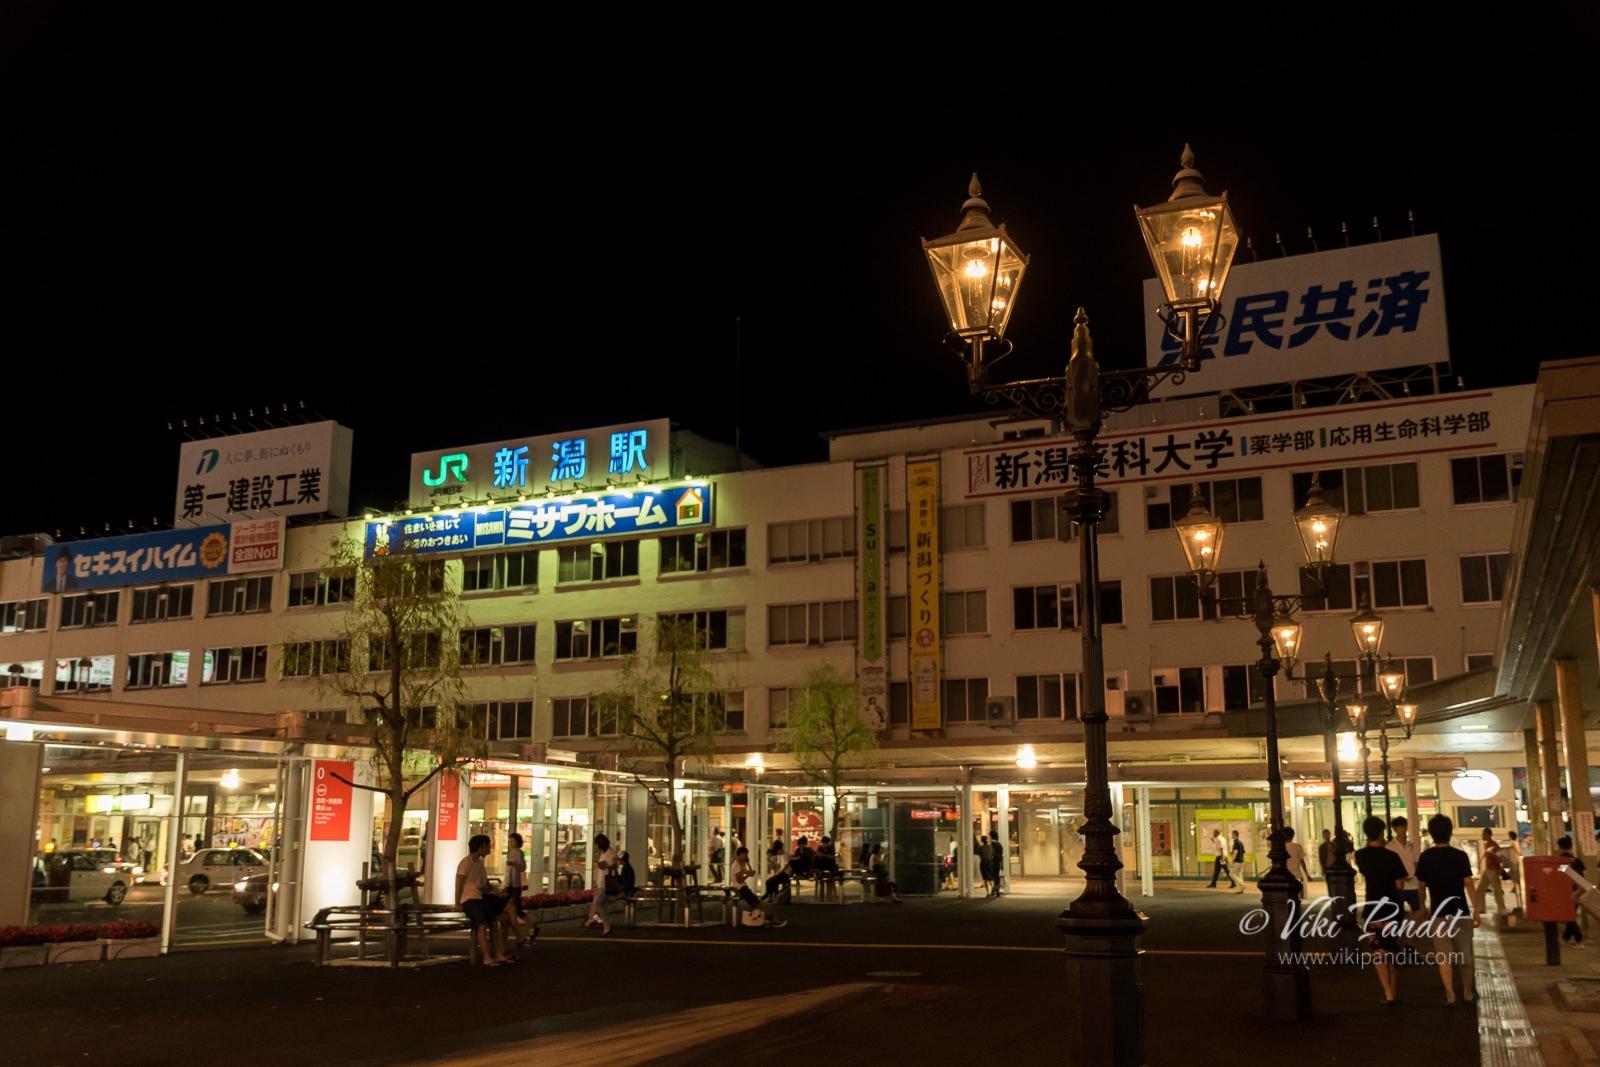 JR Station Niigata